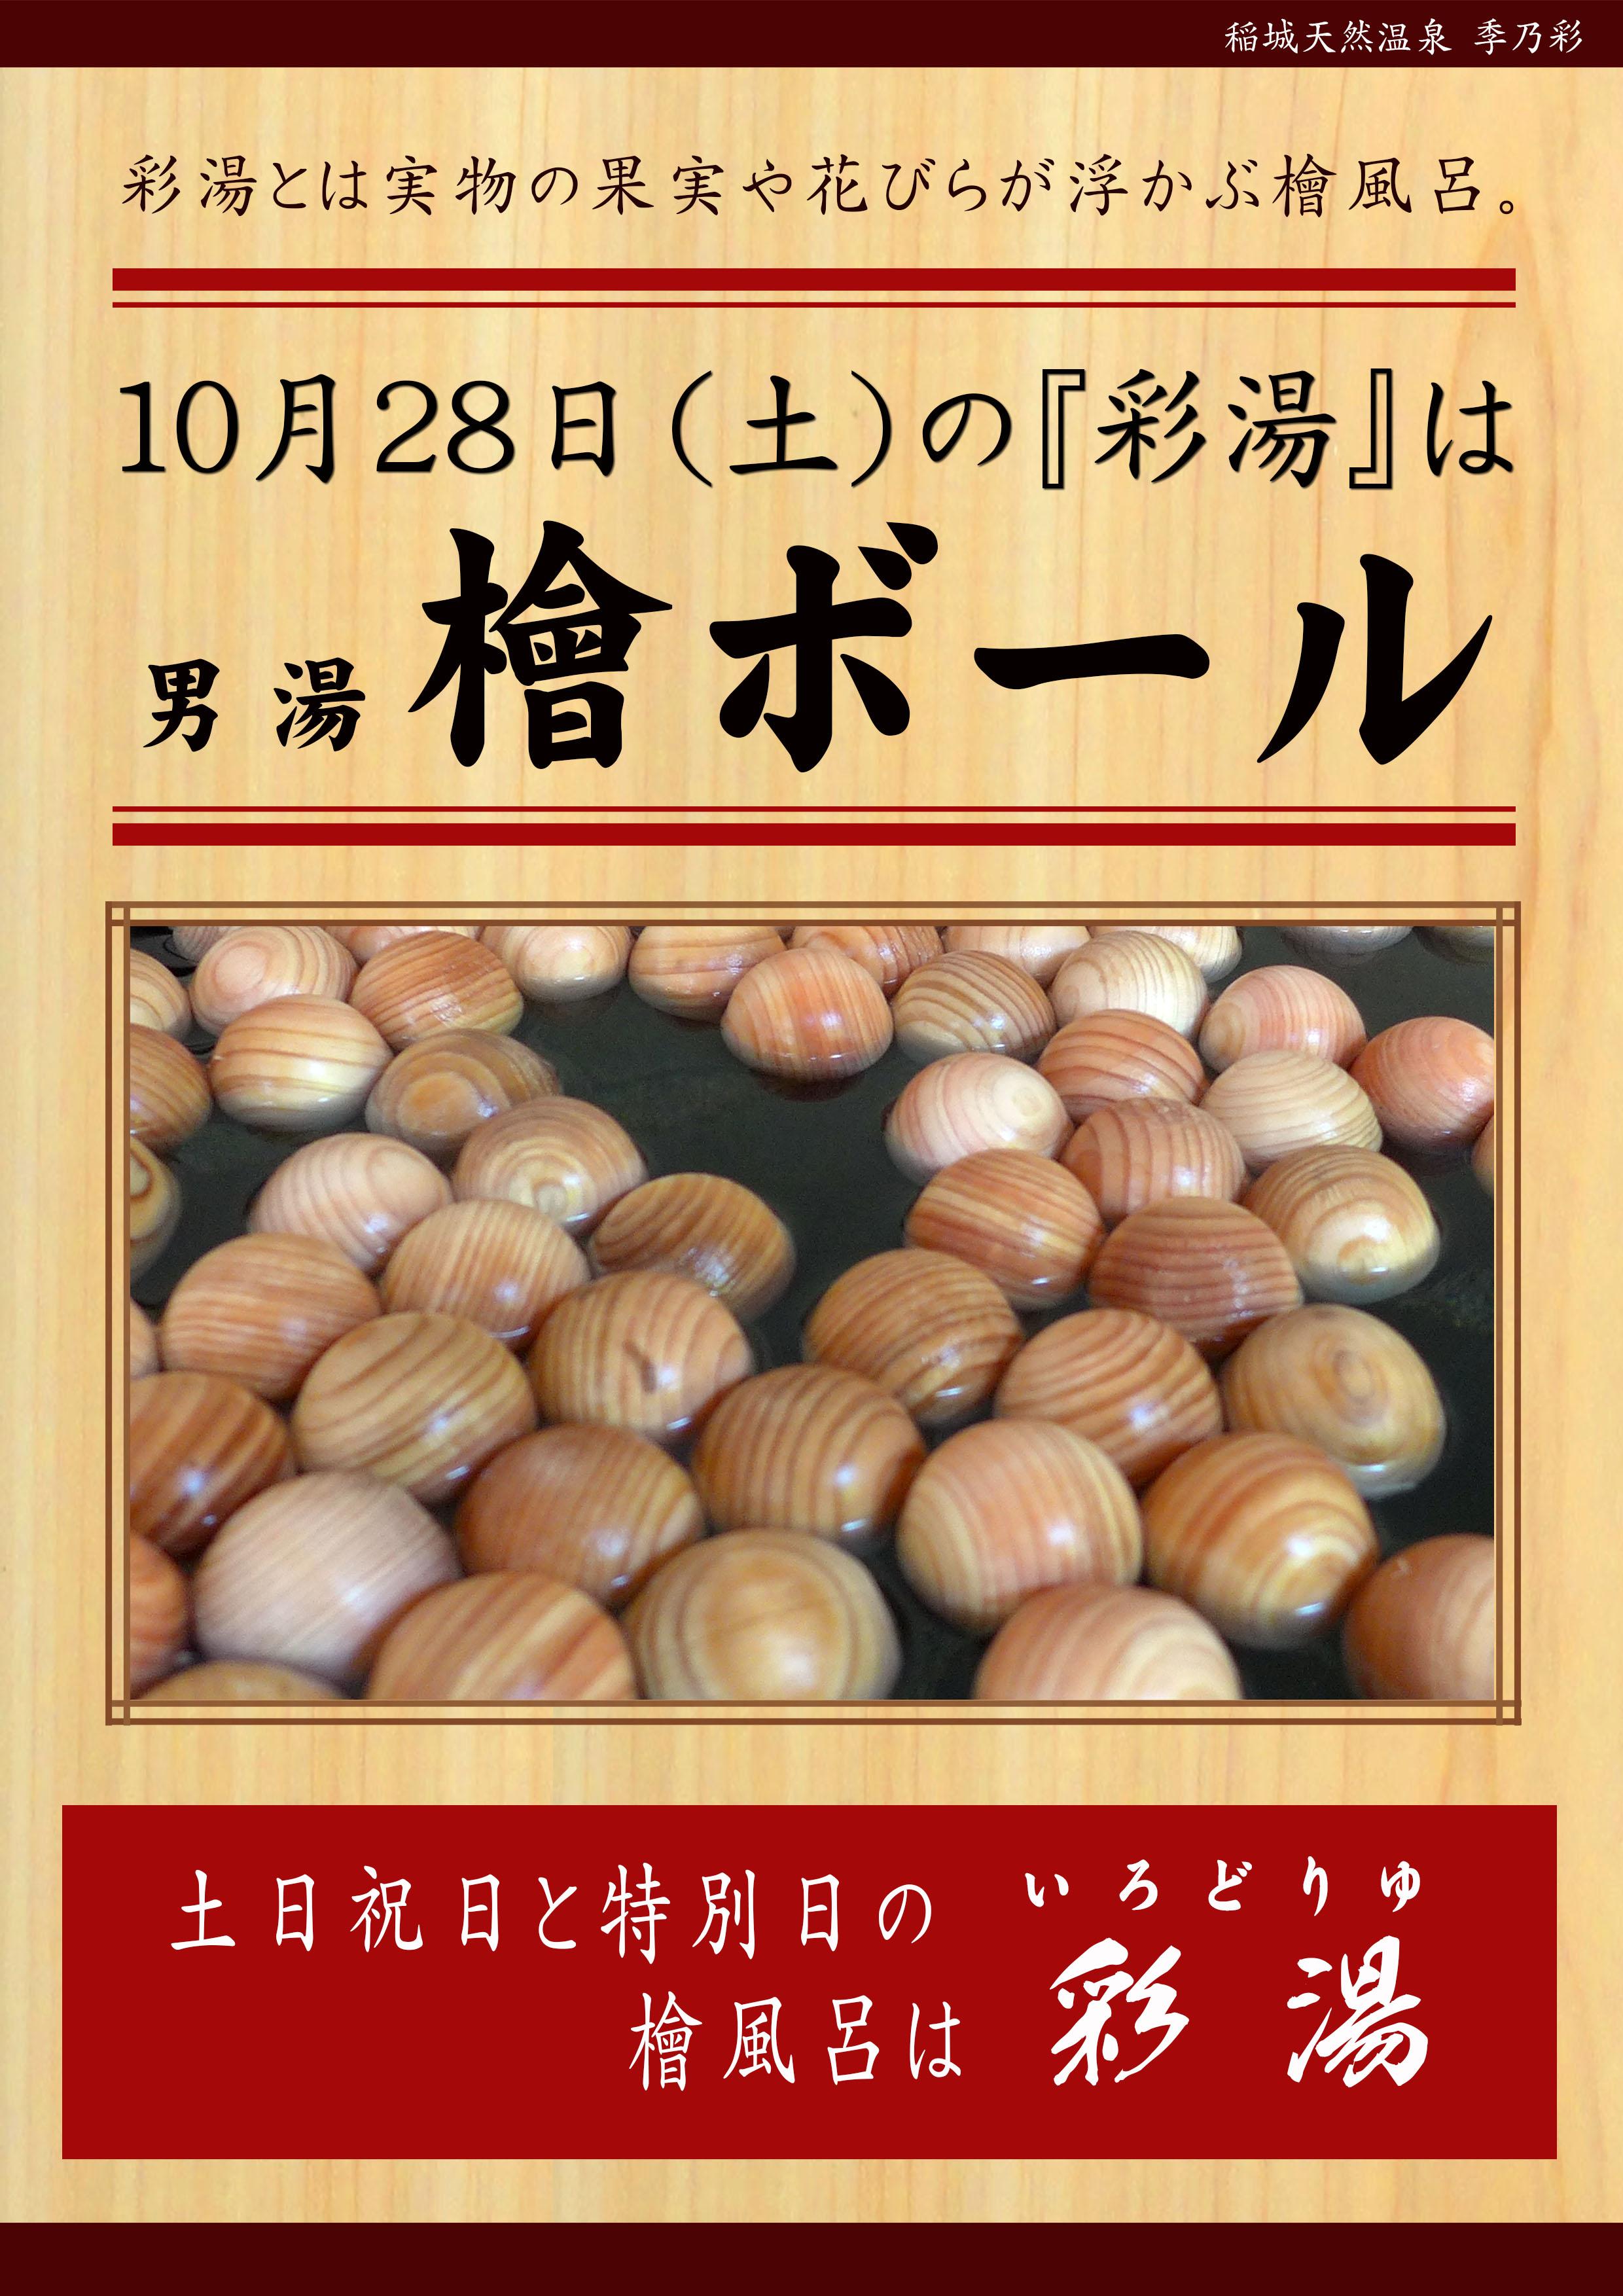 20171028POP イベント 彩湯 男湯 檜ボール